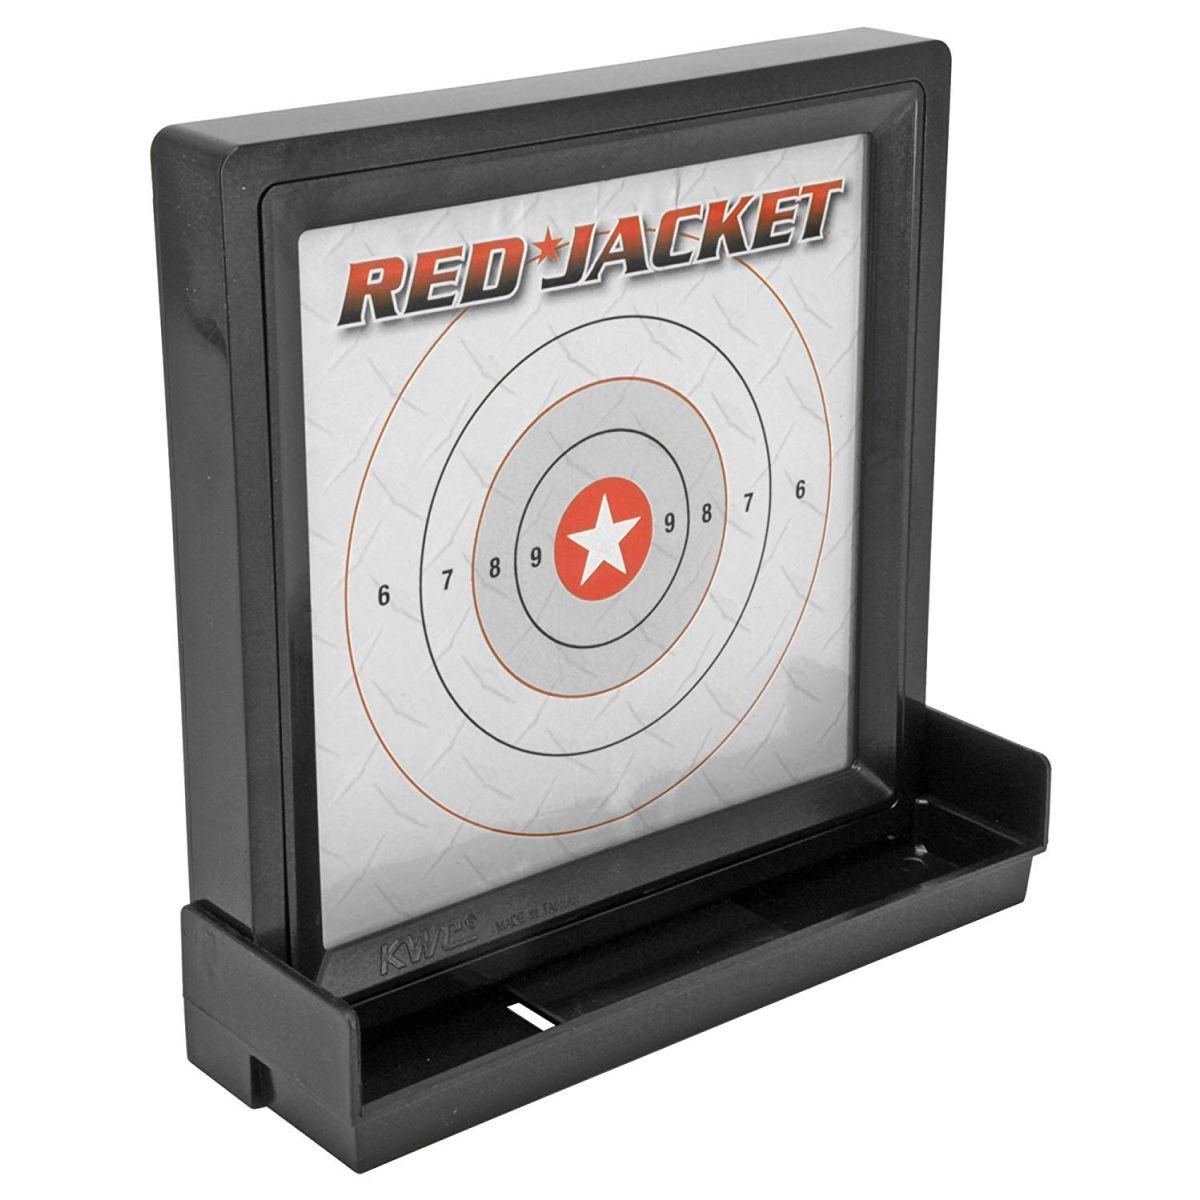 Umarex Red Jacket M1911 6mm Airsoft Spring Pistol Target Pack target